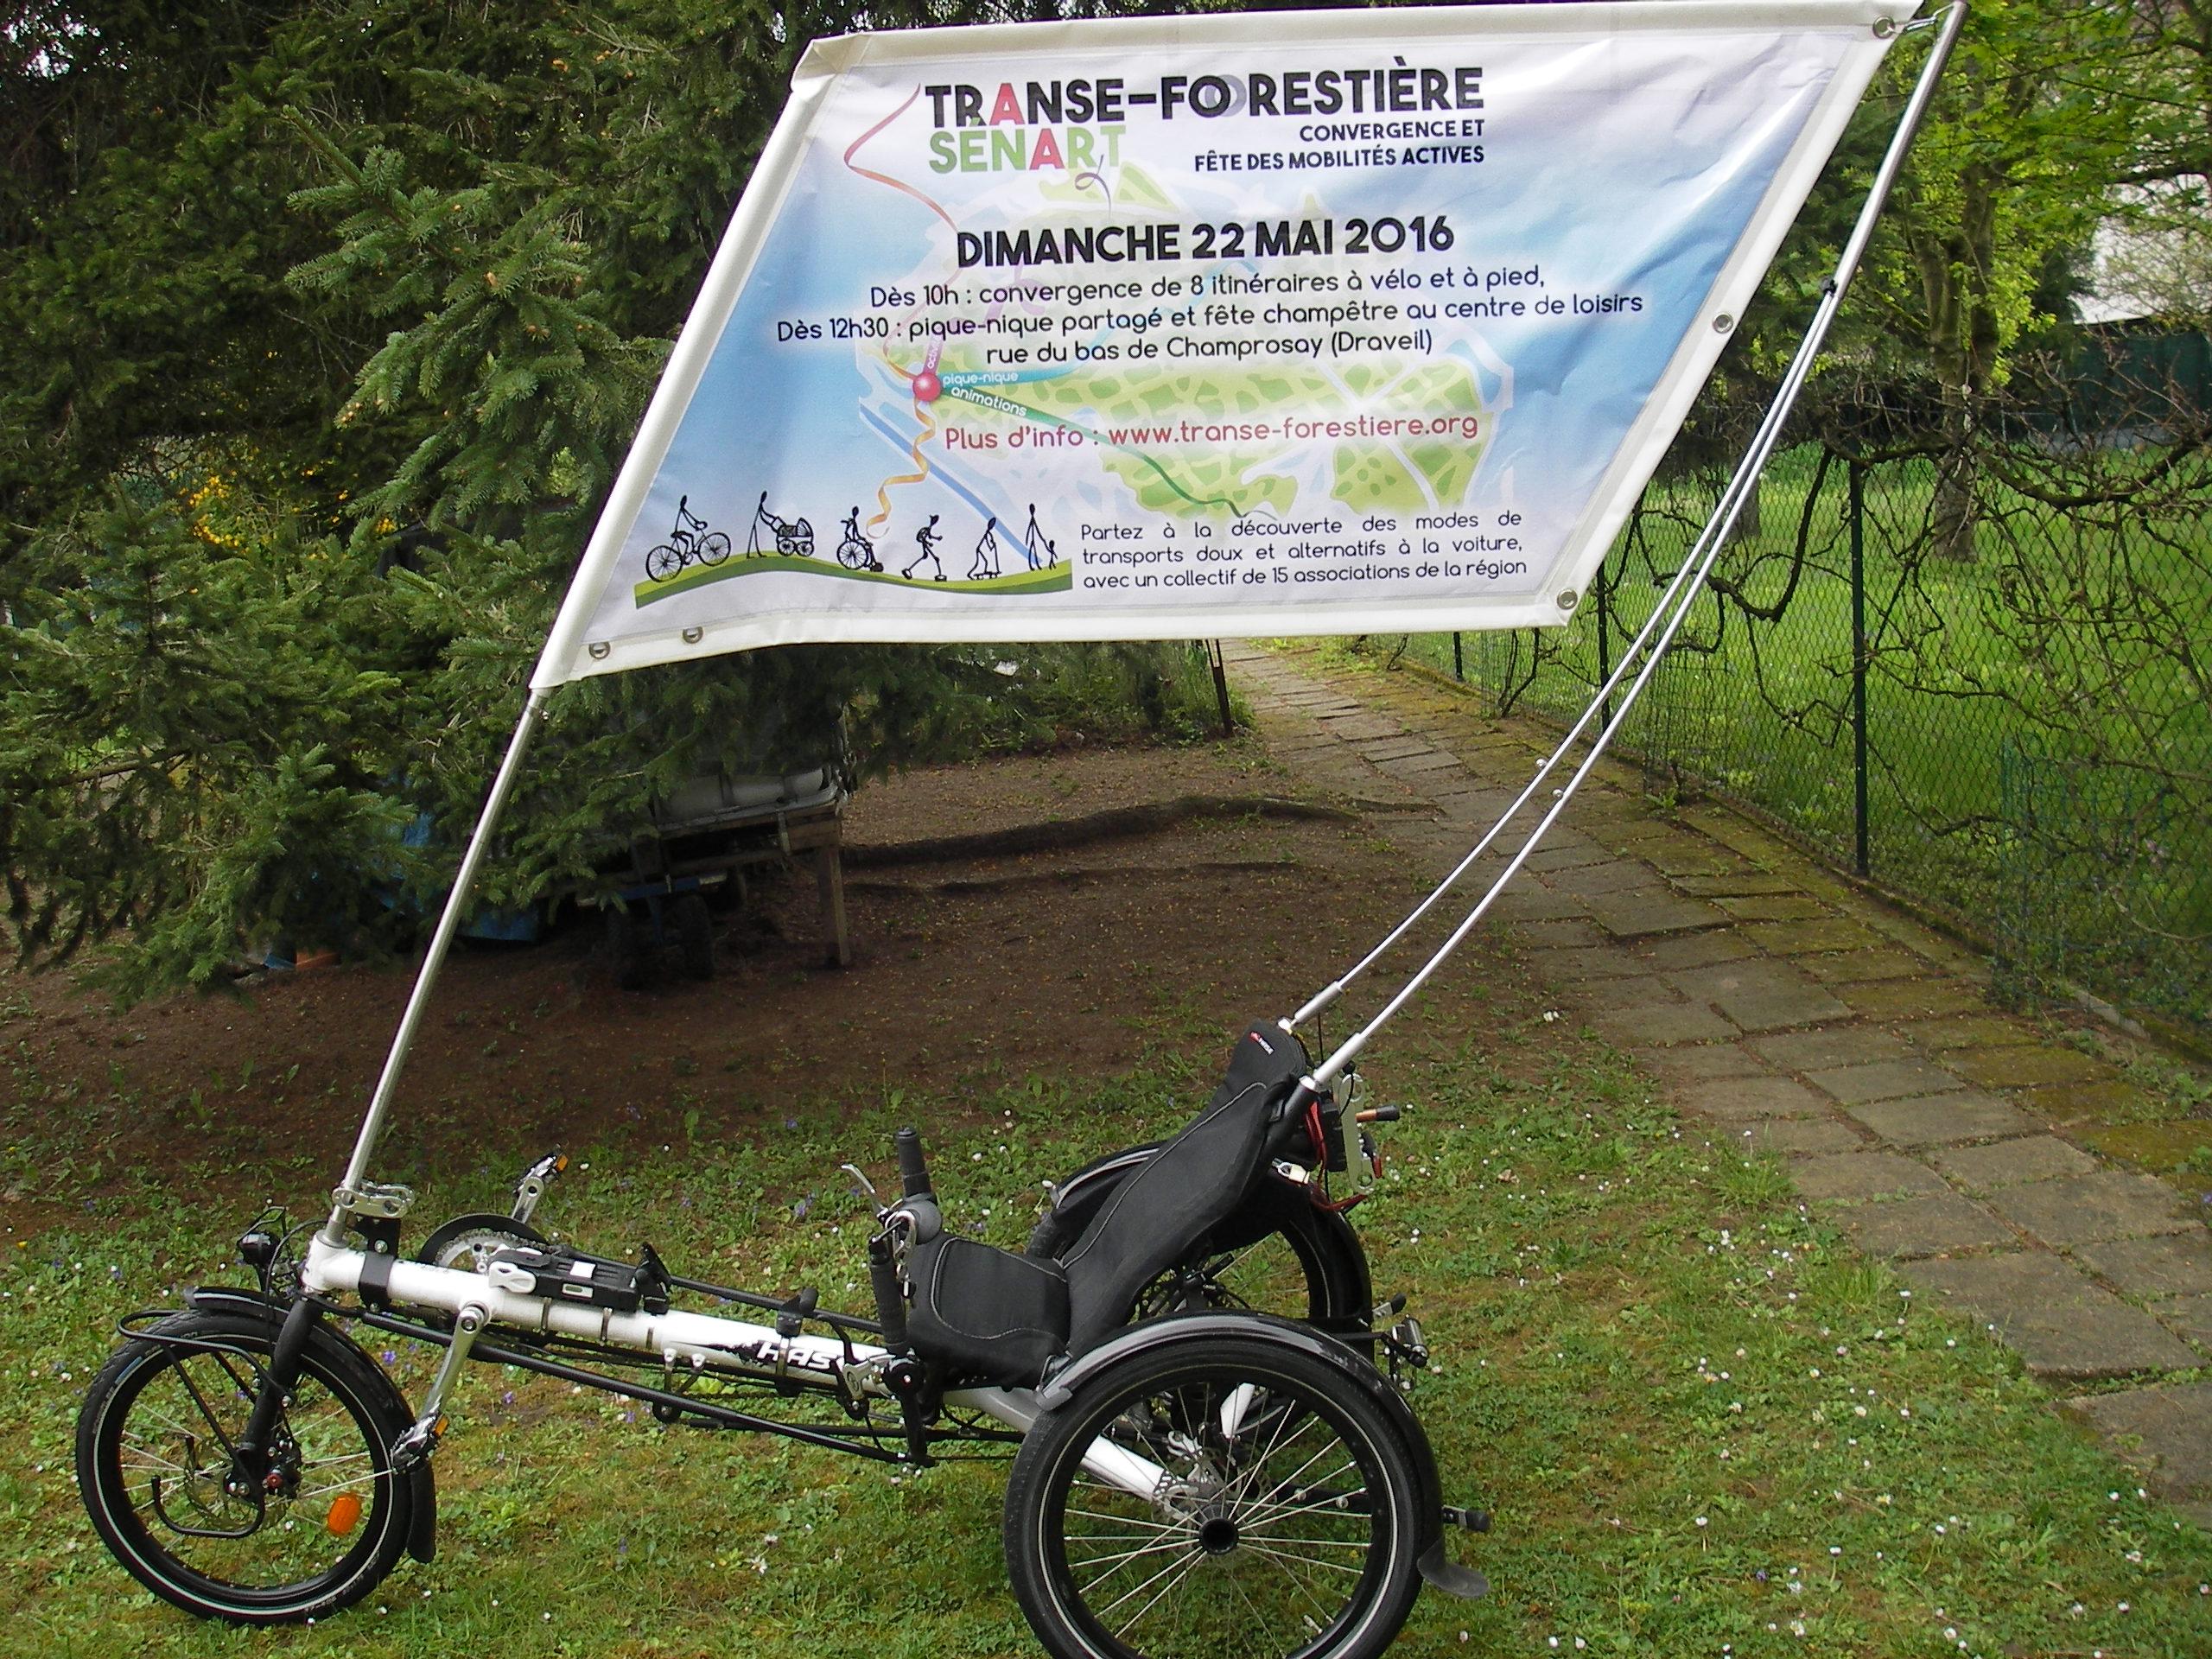 bannière sur tricycle couché Kettwiesel Hasebikes